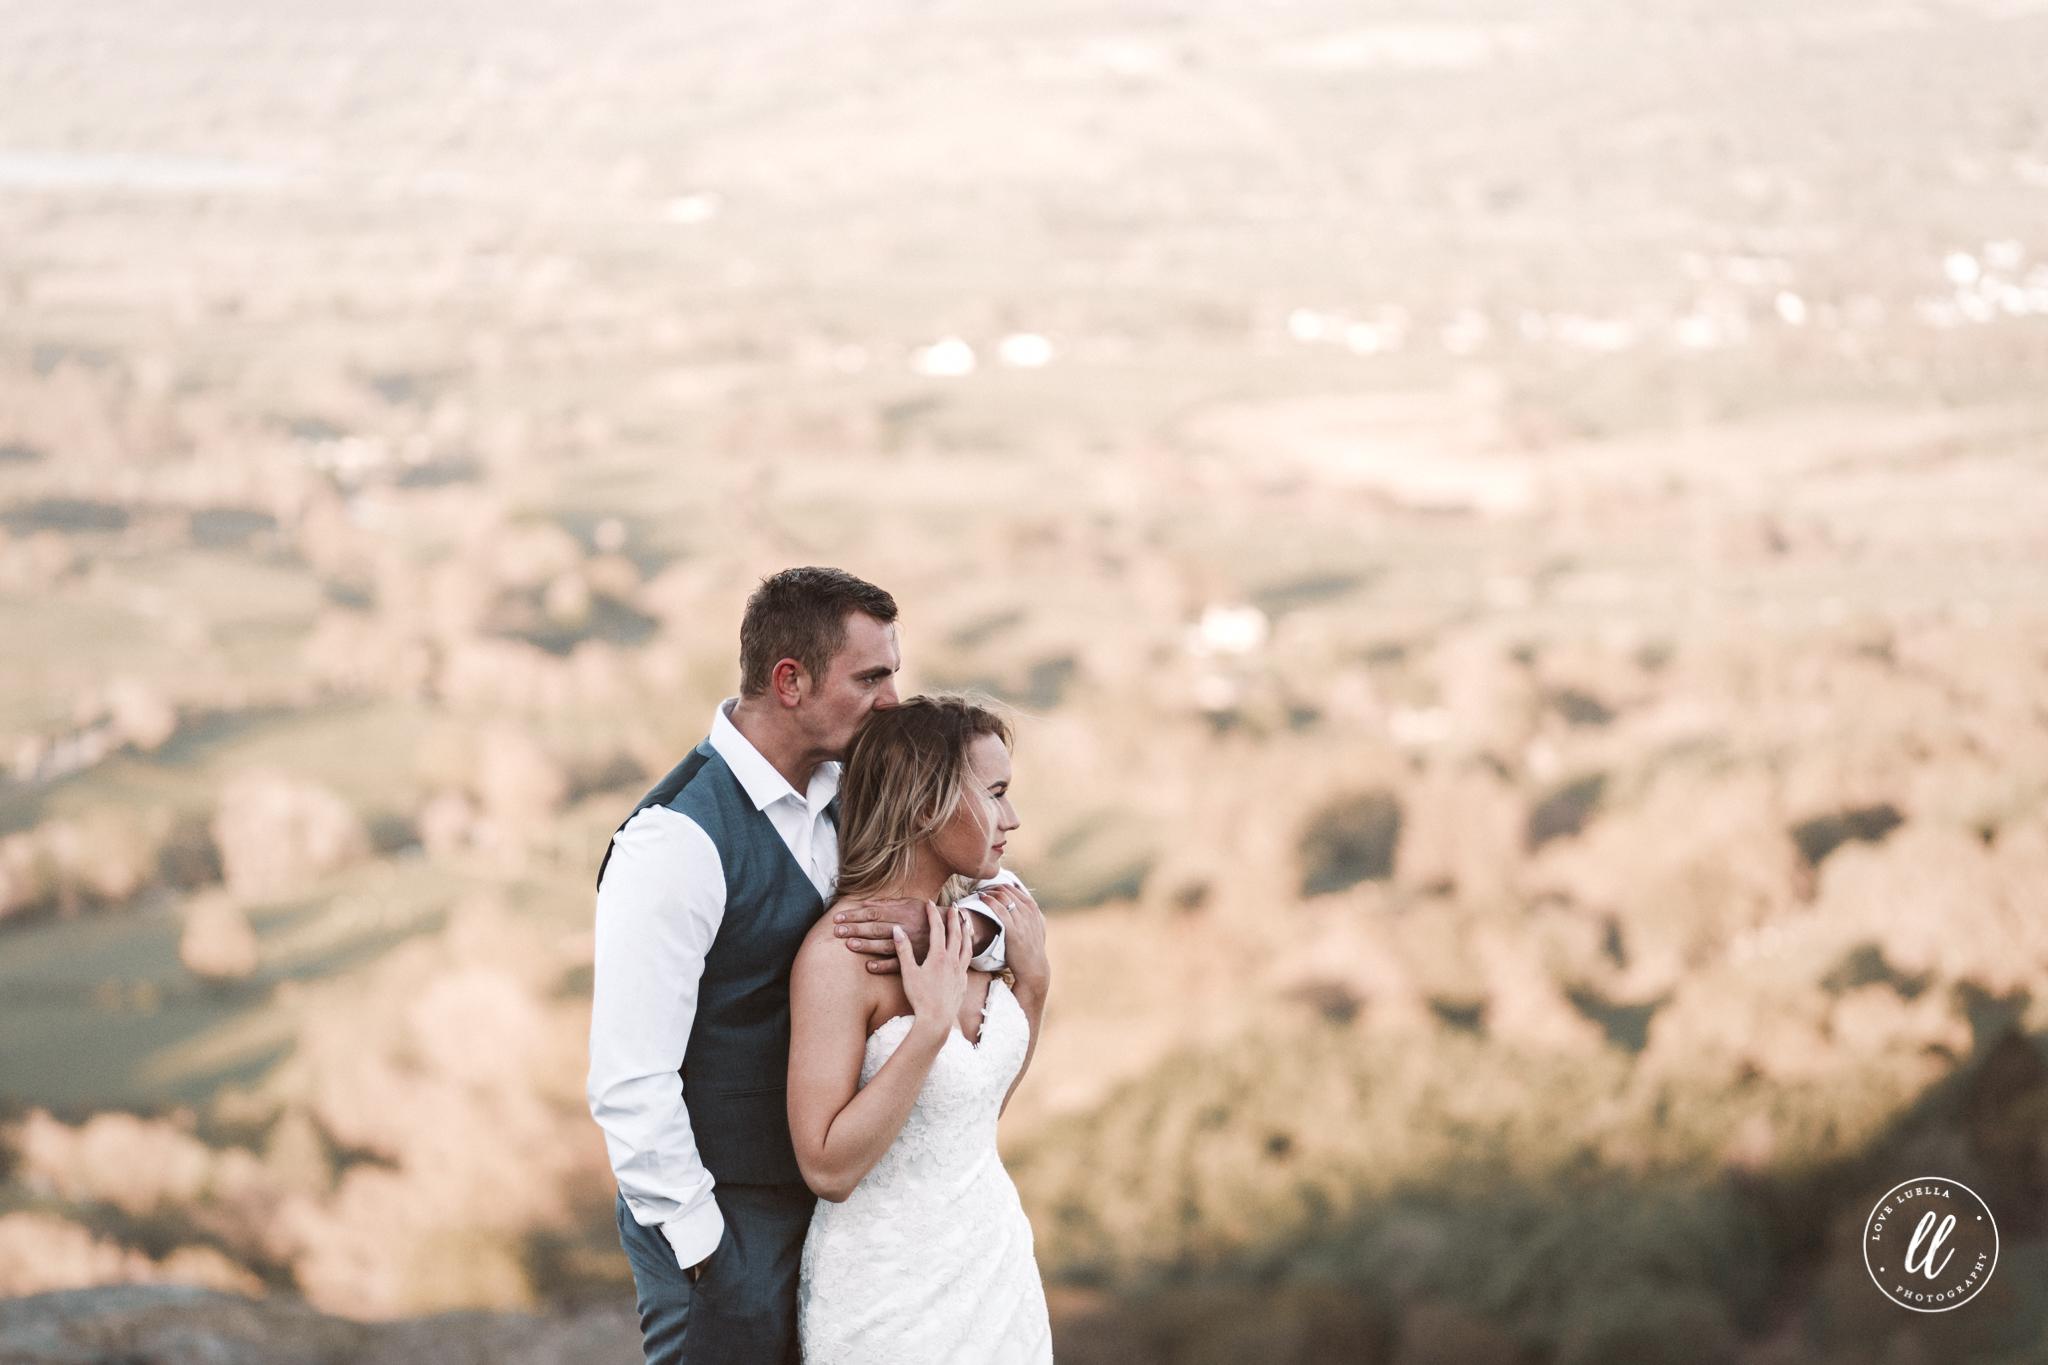 Snowdonia Post Wedding Shoot- Love Luella Photography-132.jpg